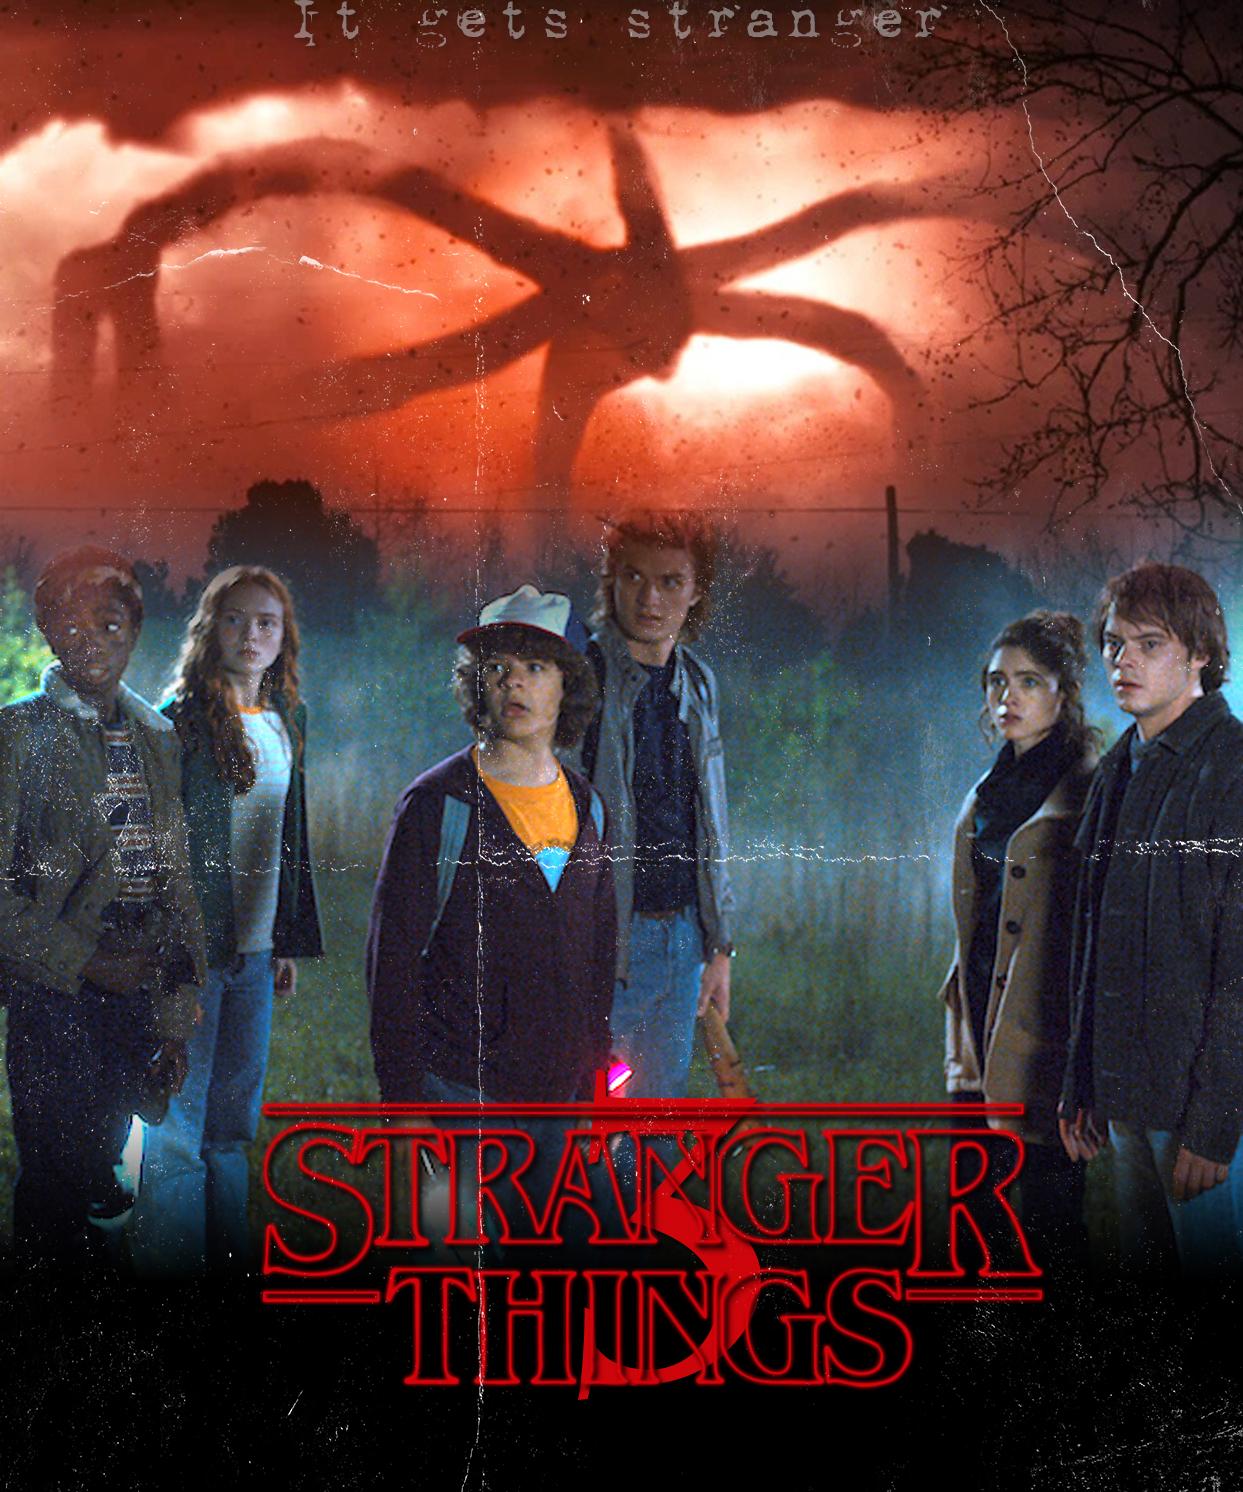 Stranger Things 3 Wallpapers - Wallpaper Cave